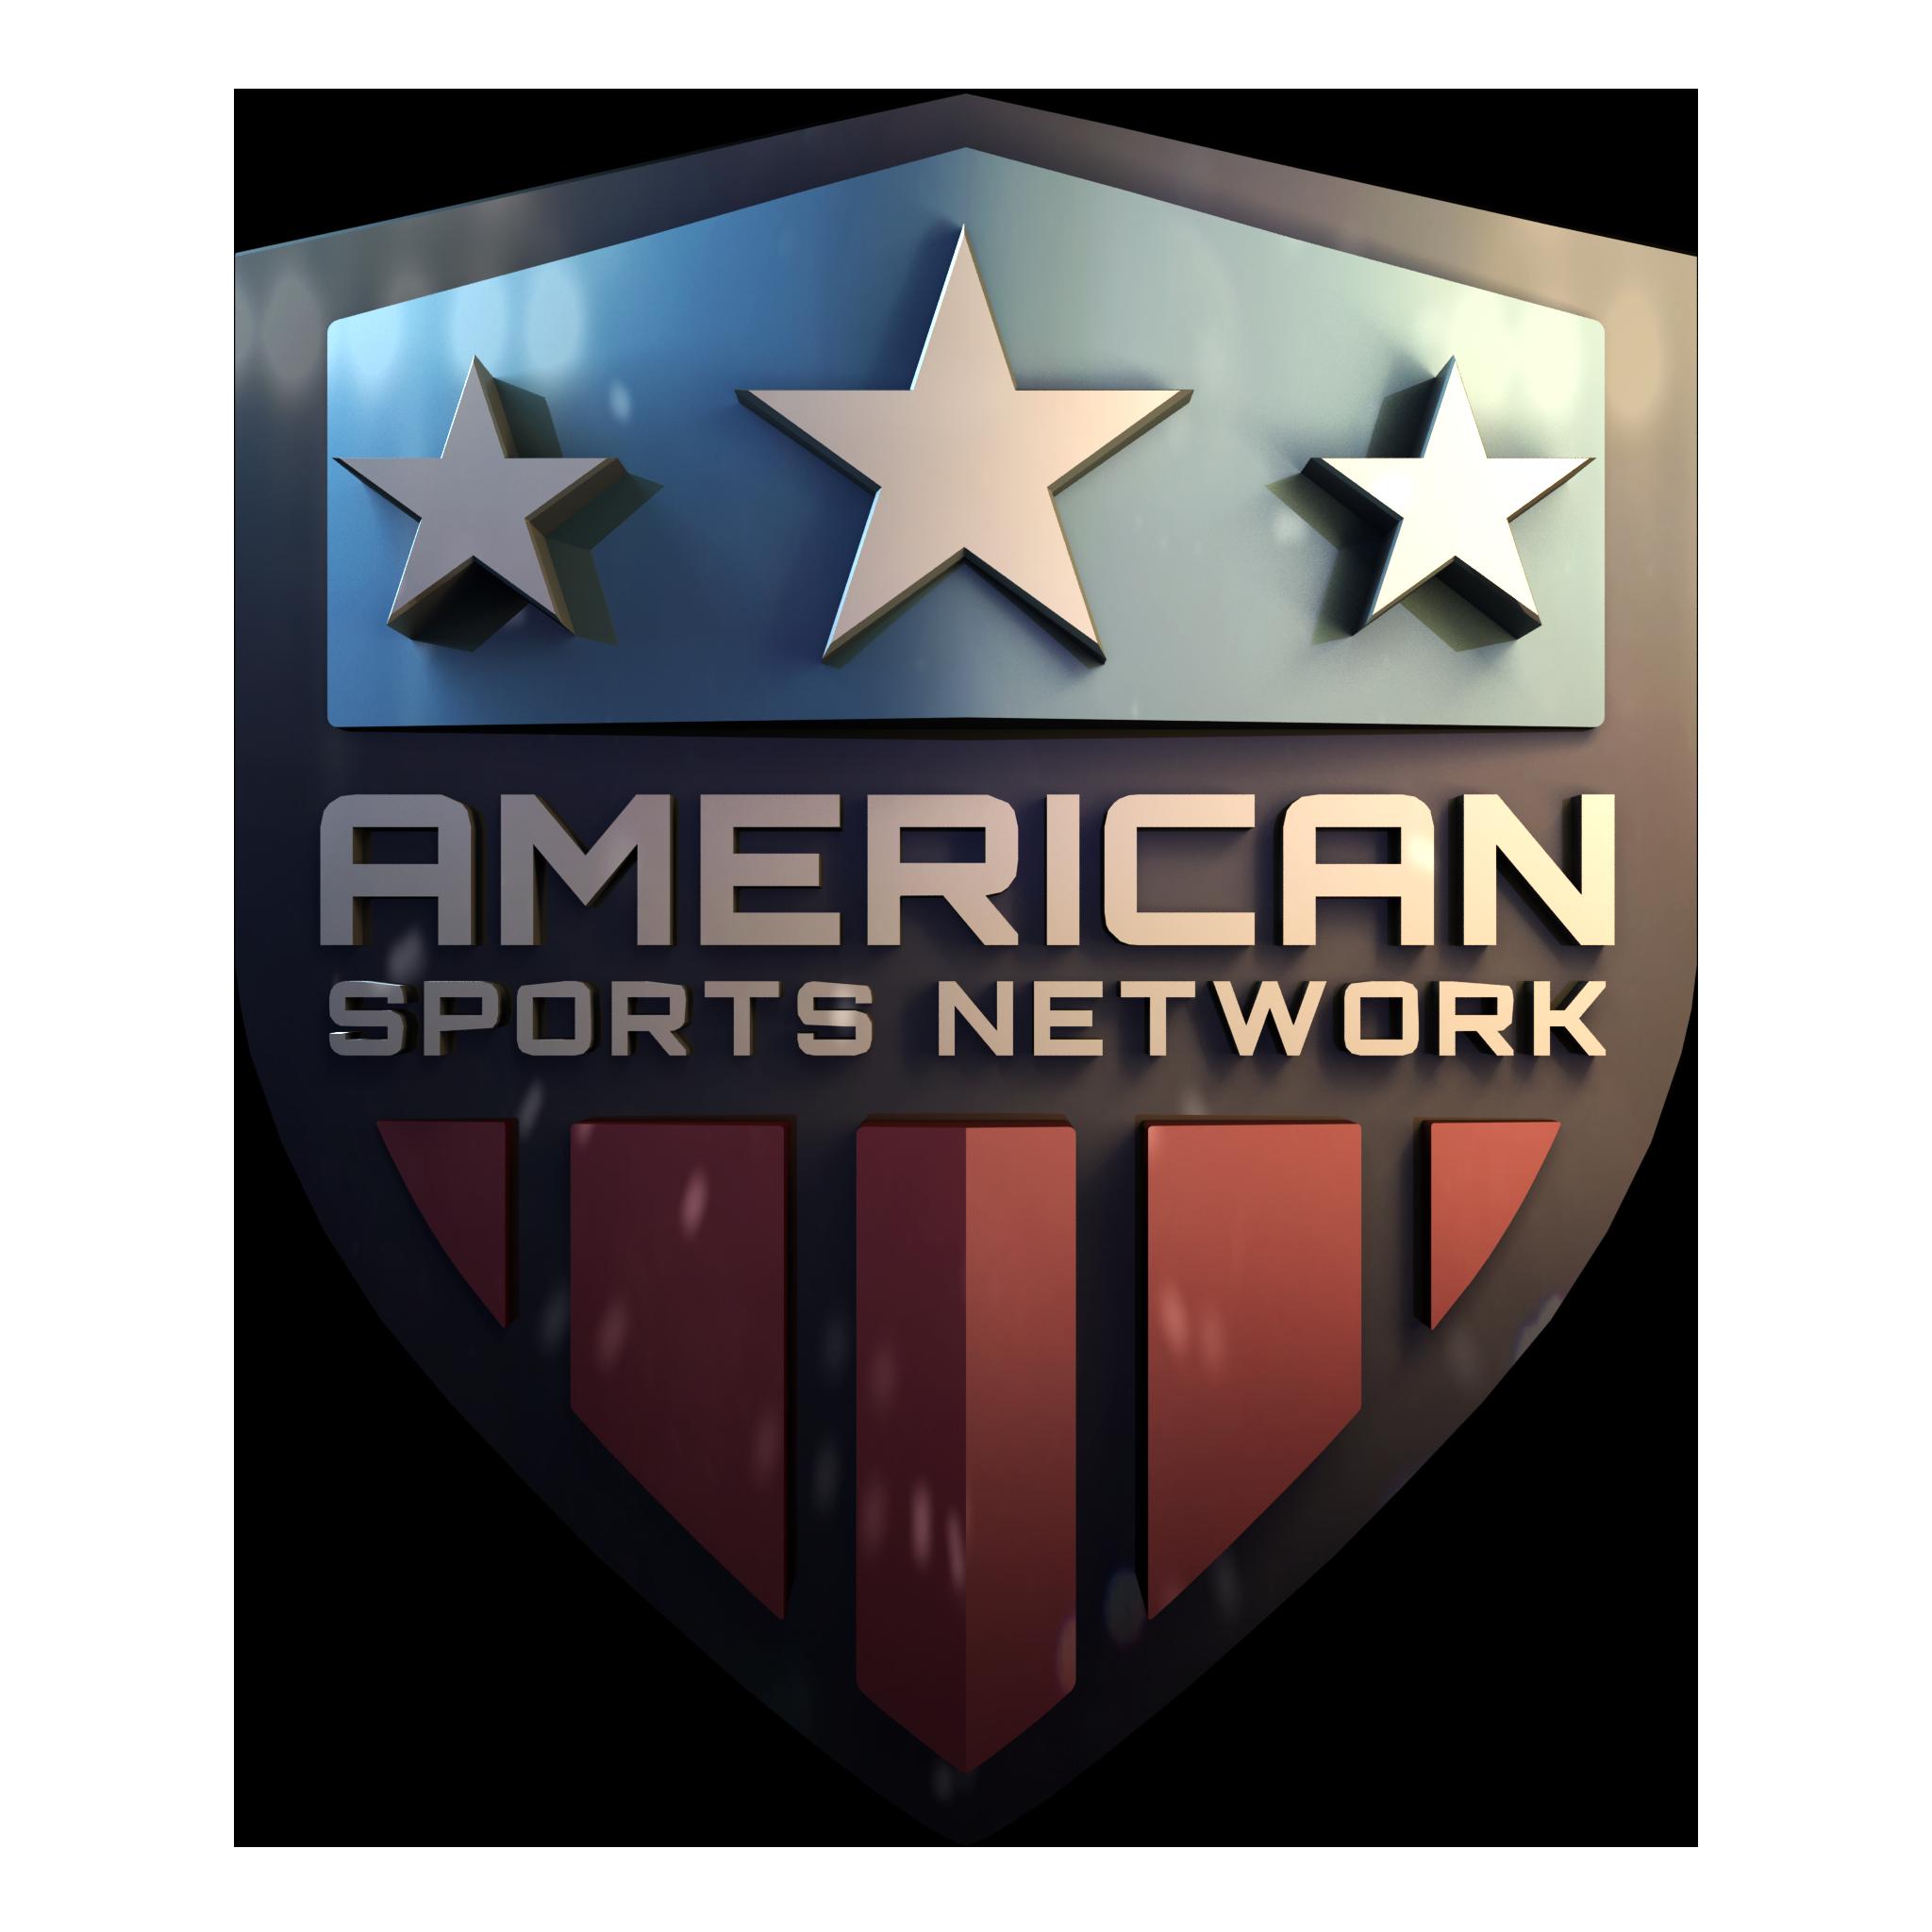 Stadium (TV network)